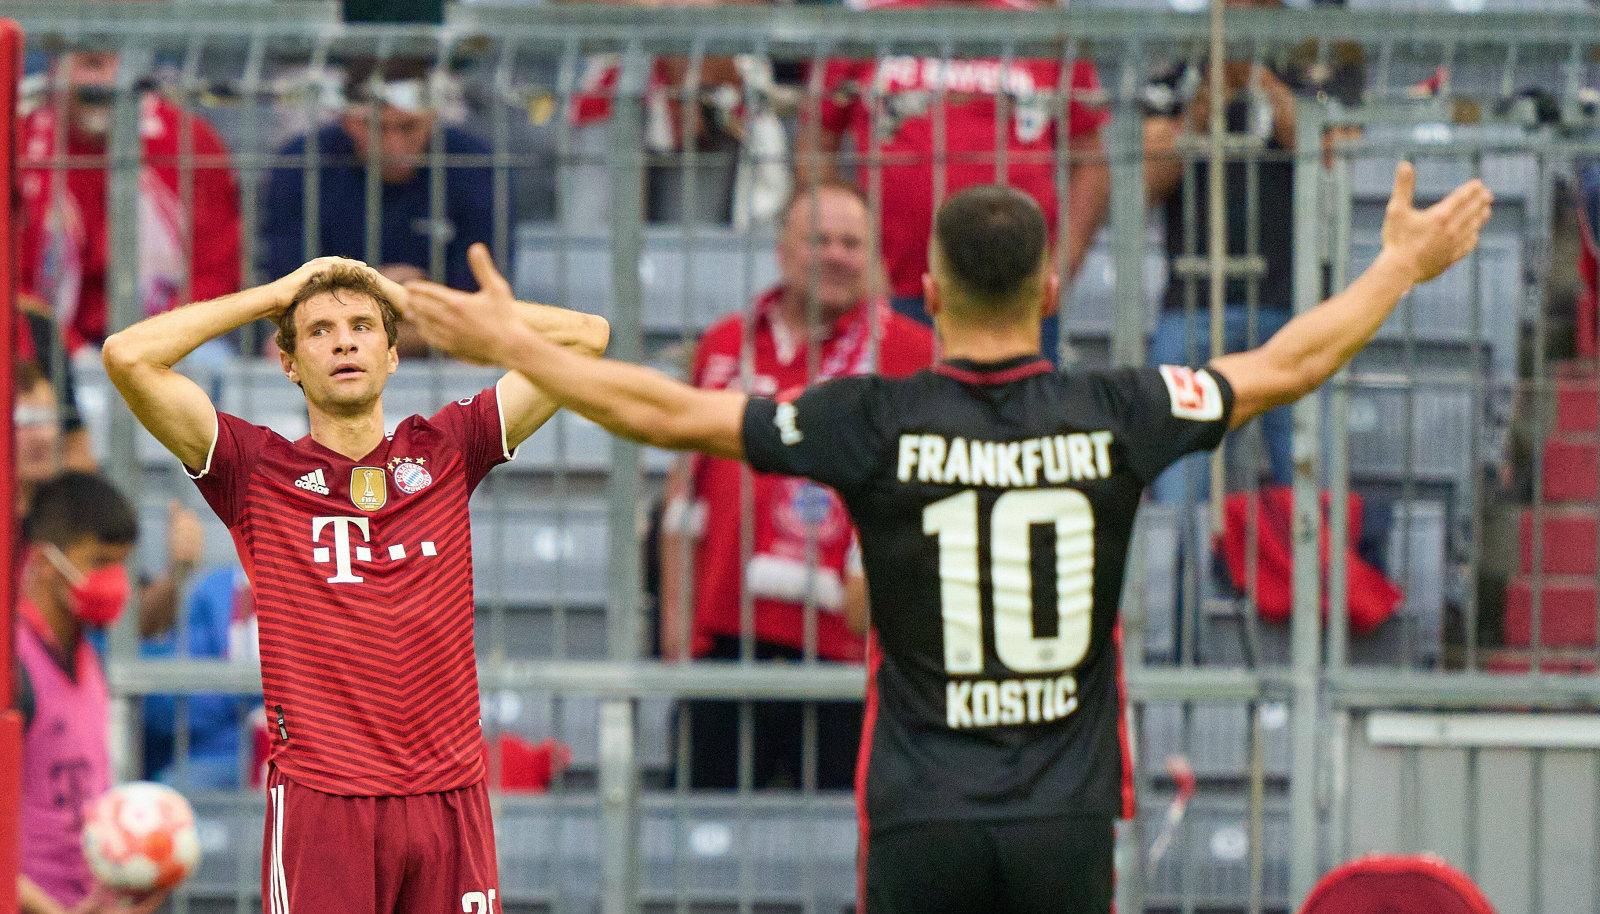 Bayern pidi Eintrachti paremust tunnistama.